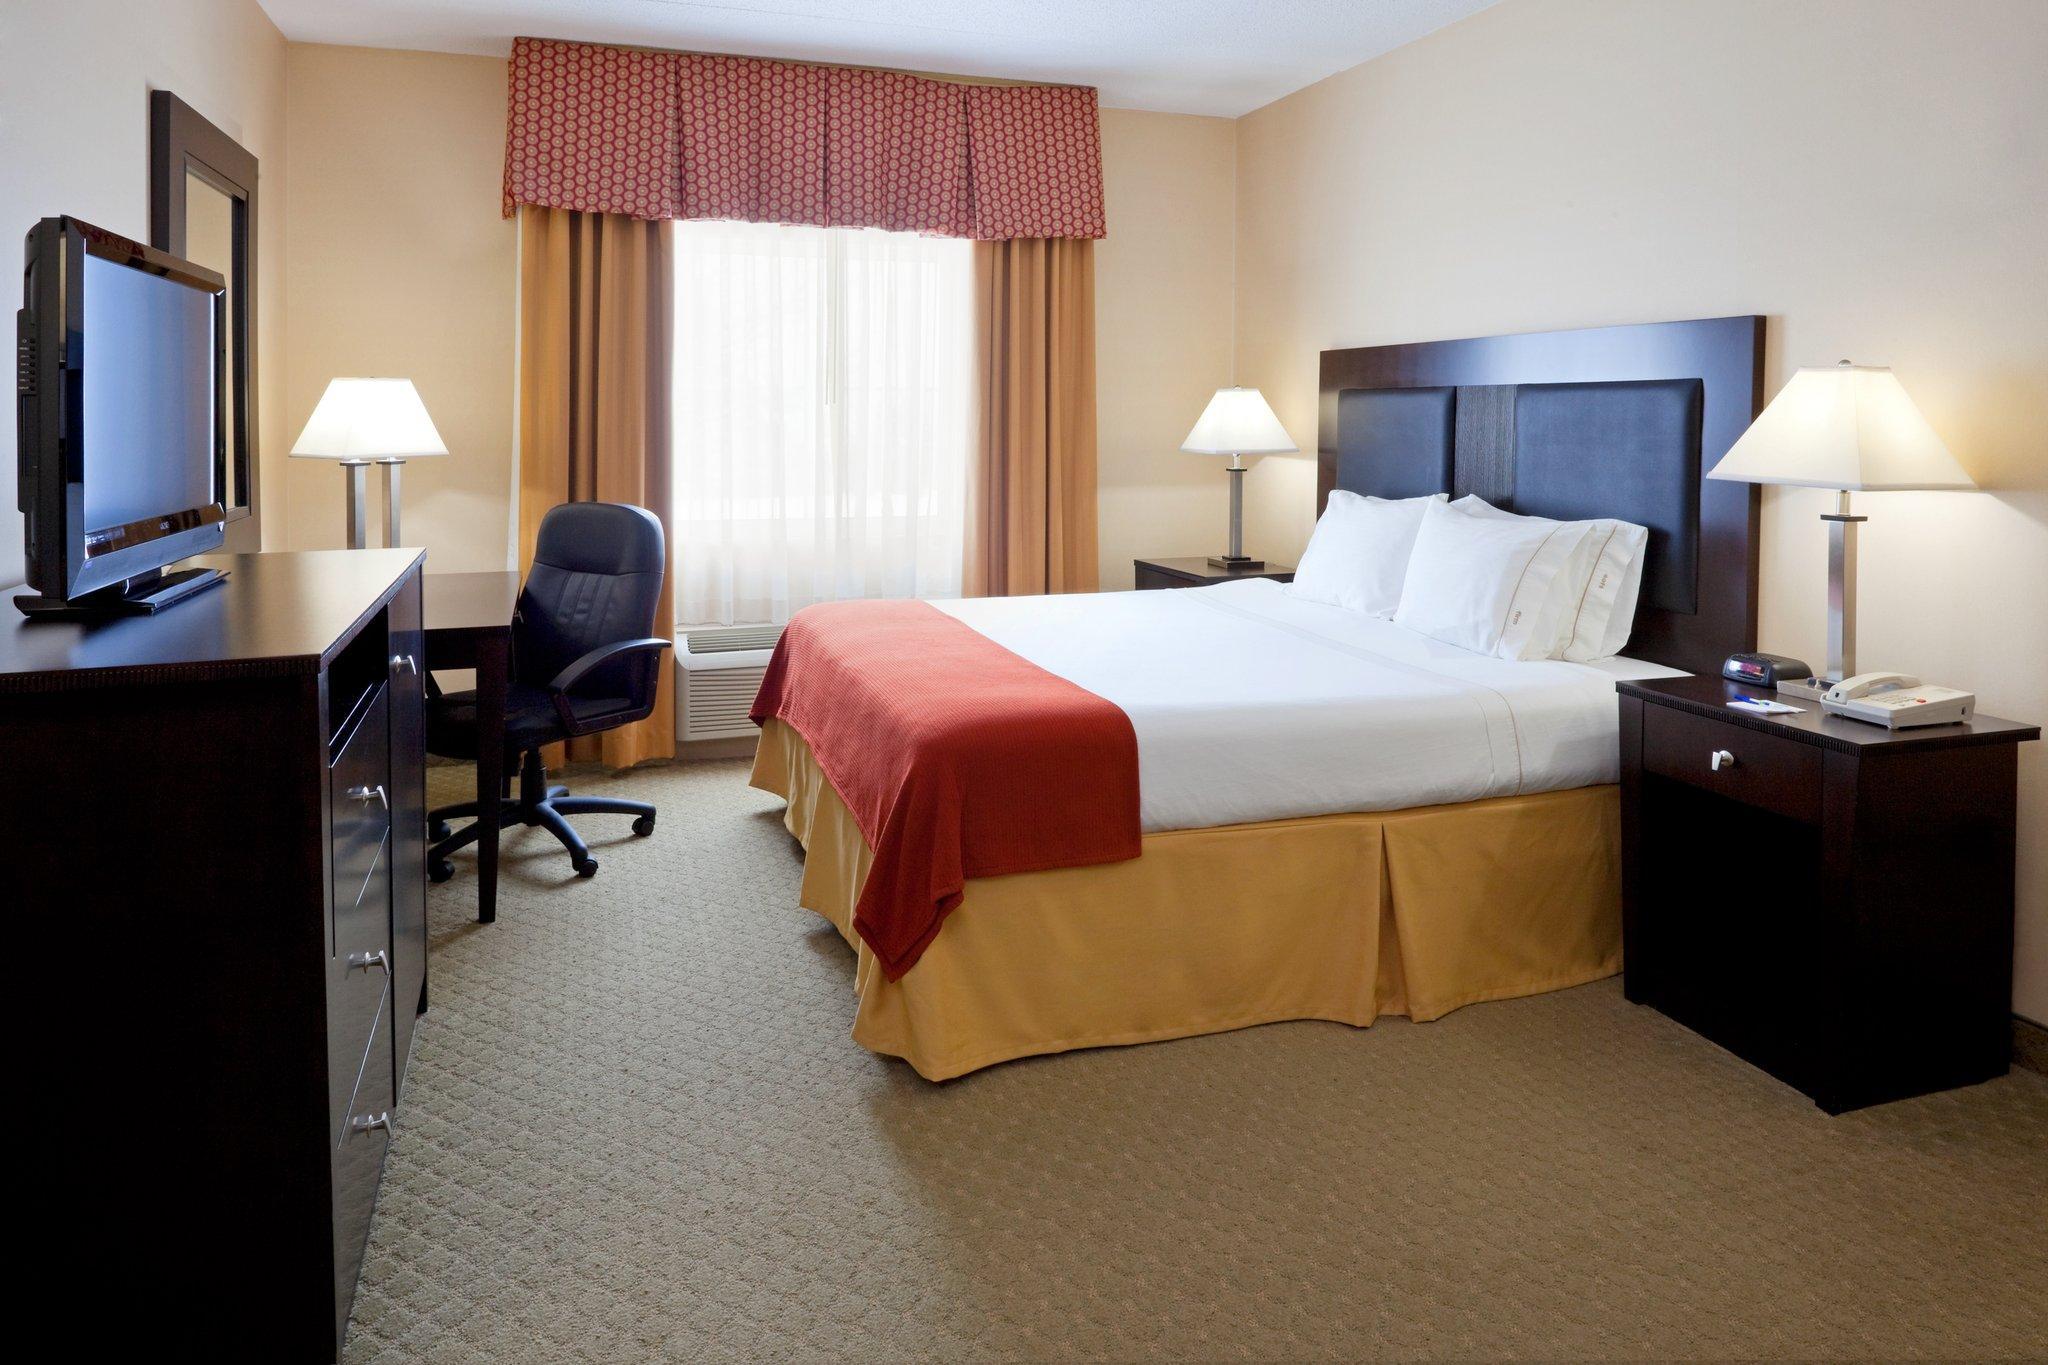 Holiday Inn Express Wilkes-Barre/Scranton Airport